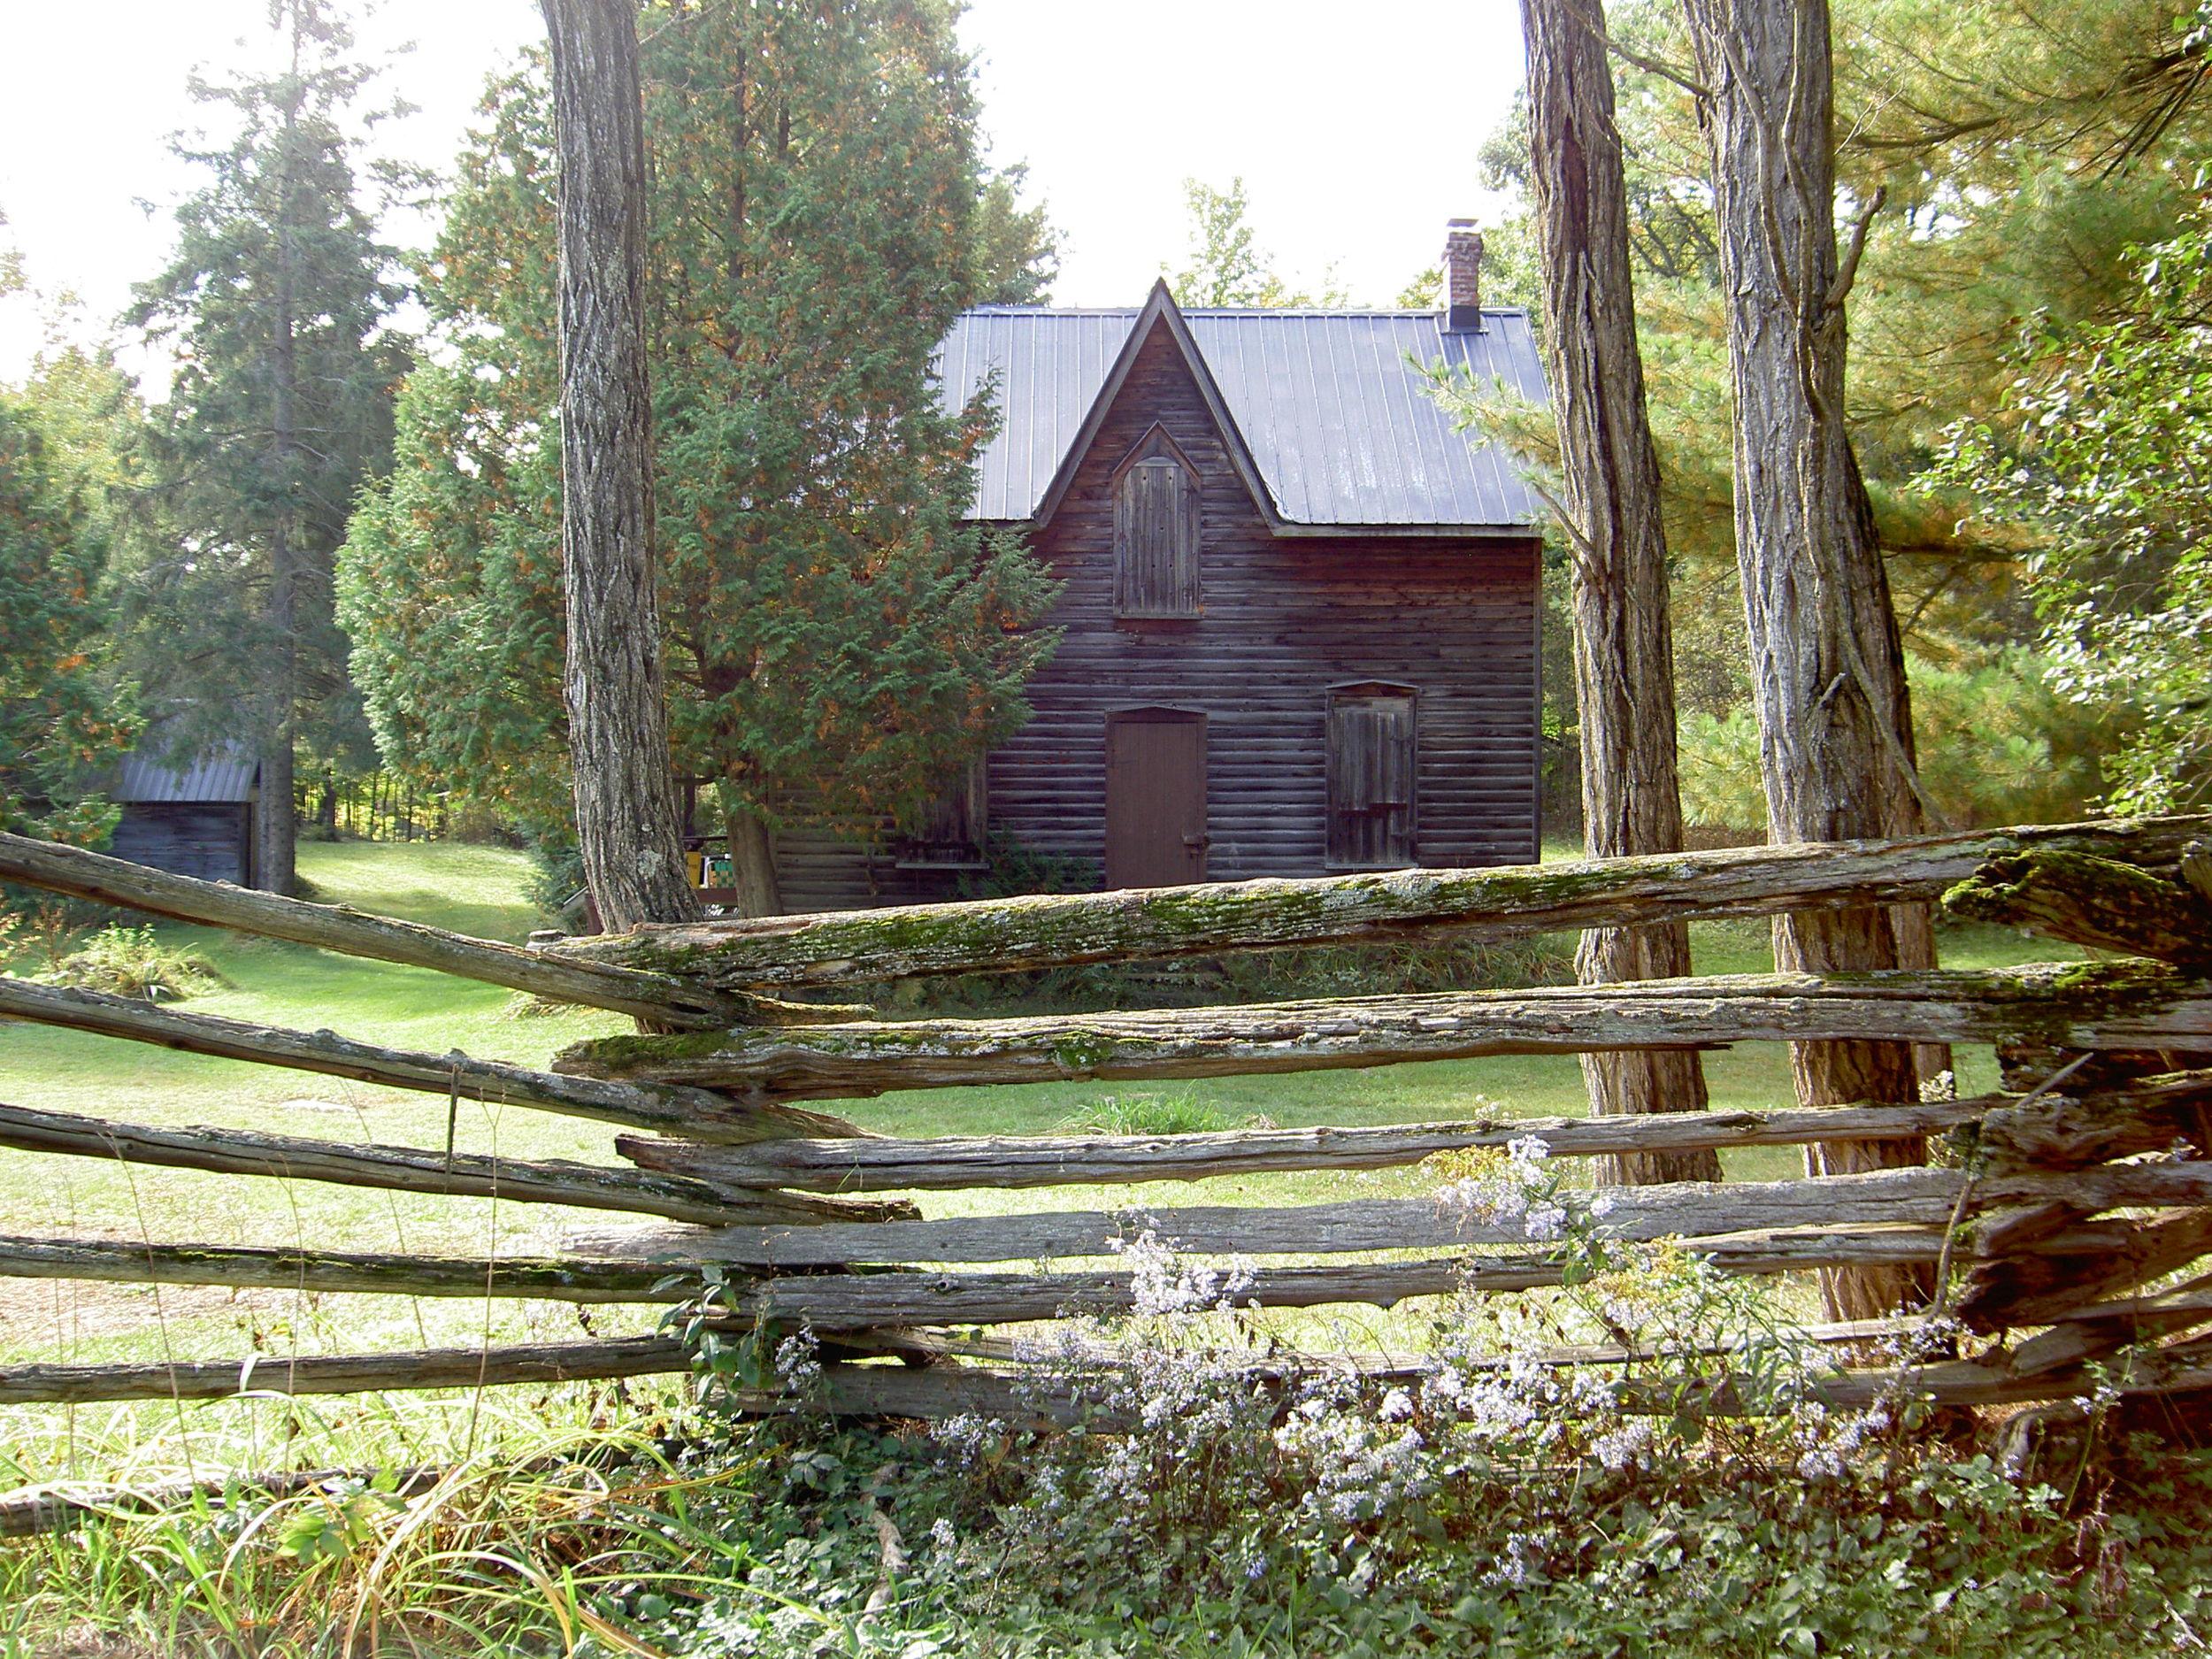 Seasonal residence now owned by Darren Neill